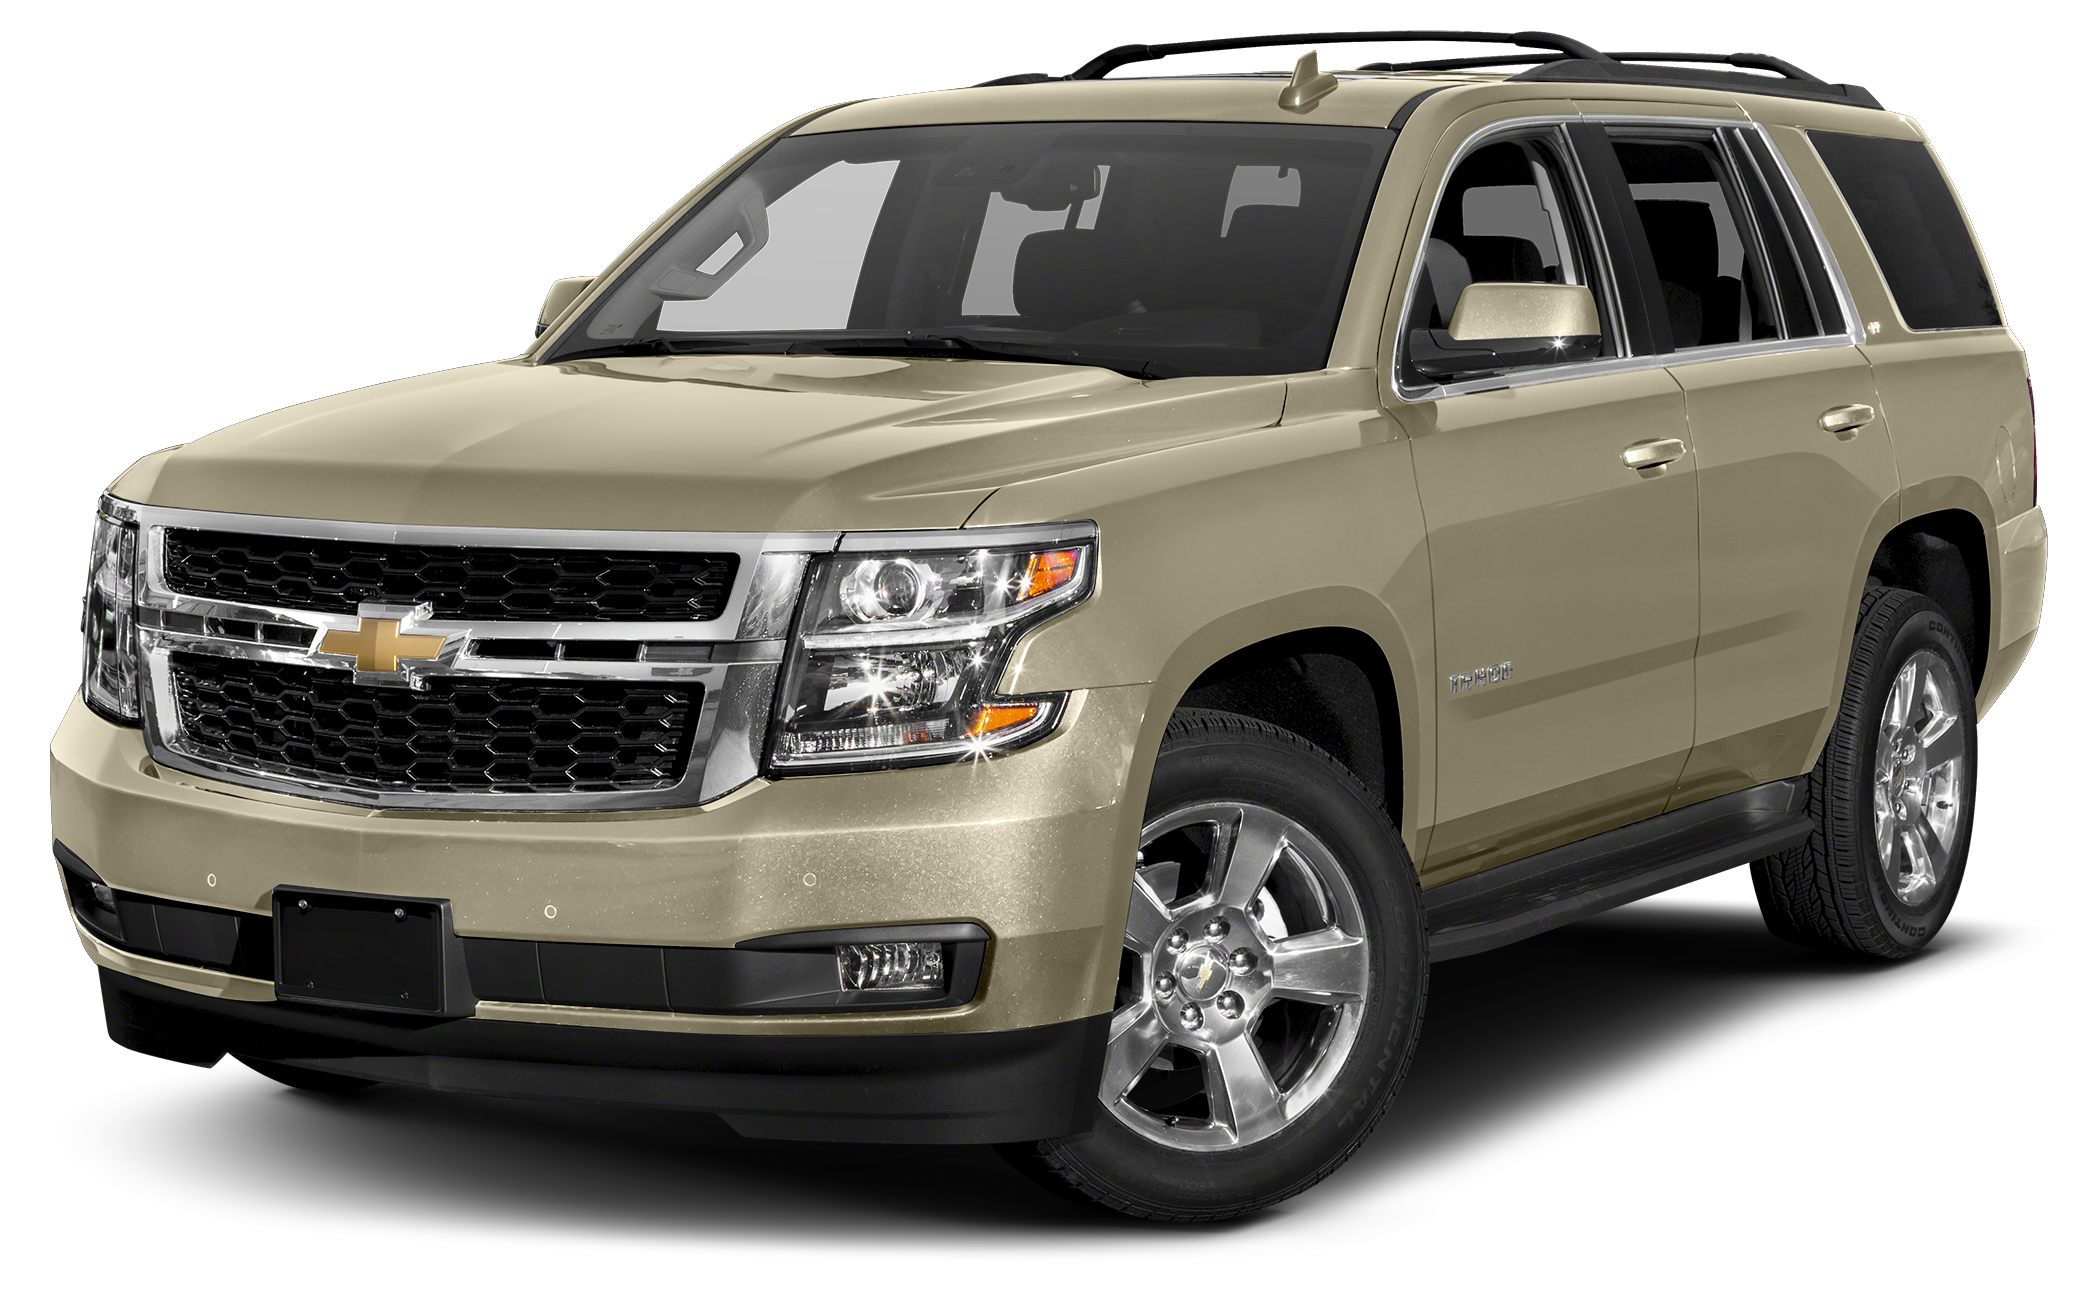 2017 Chevrolet Tahoe LT Miles 22590Color Champagne Silver Metallic Stock M7222 VIN 1GNSCBKC5